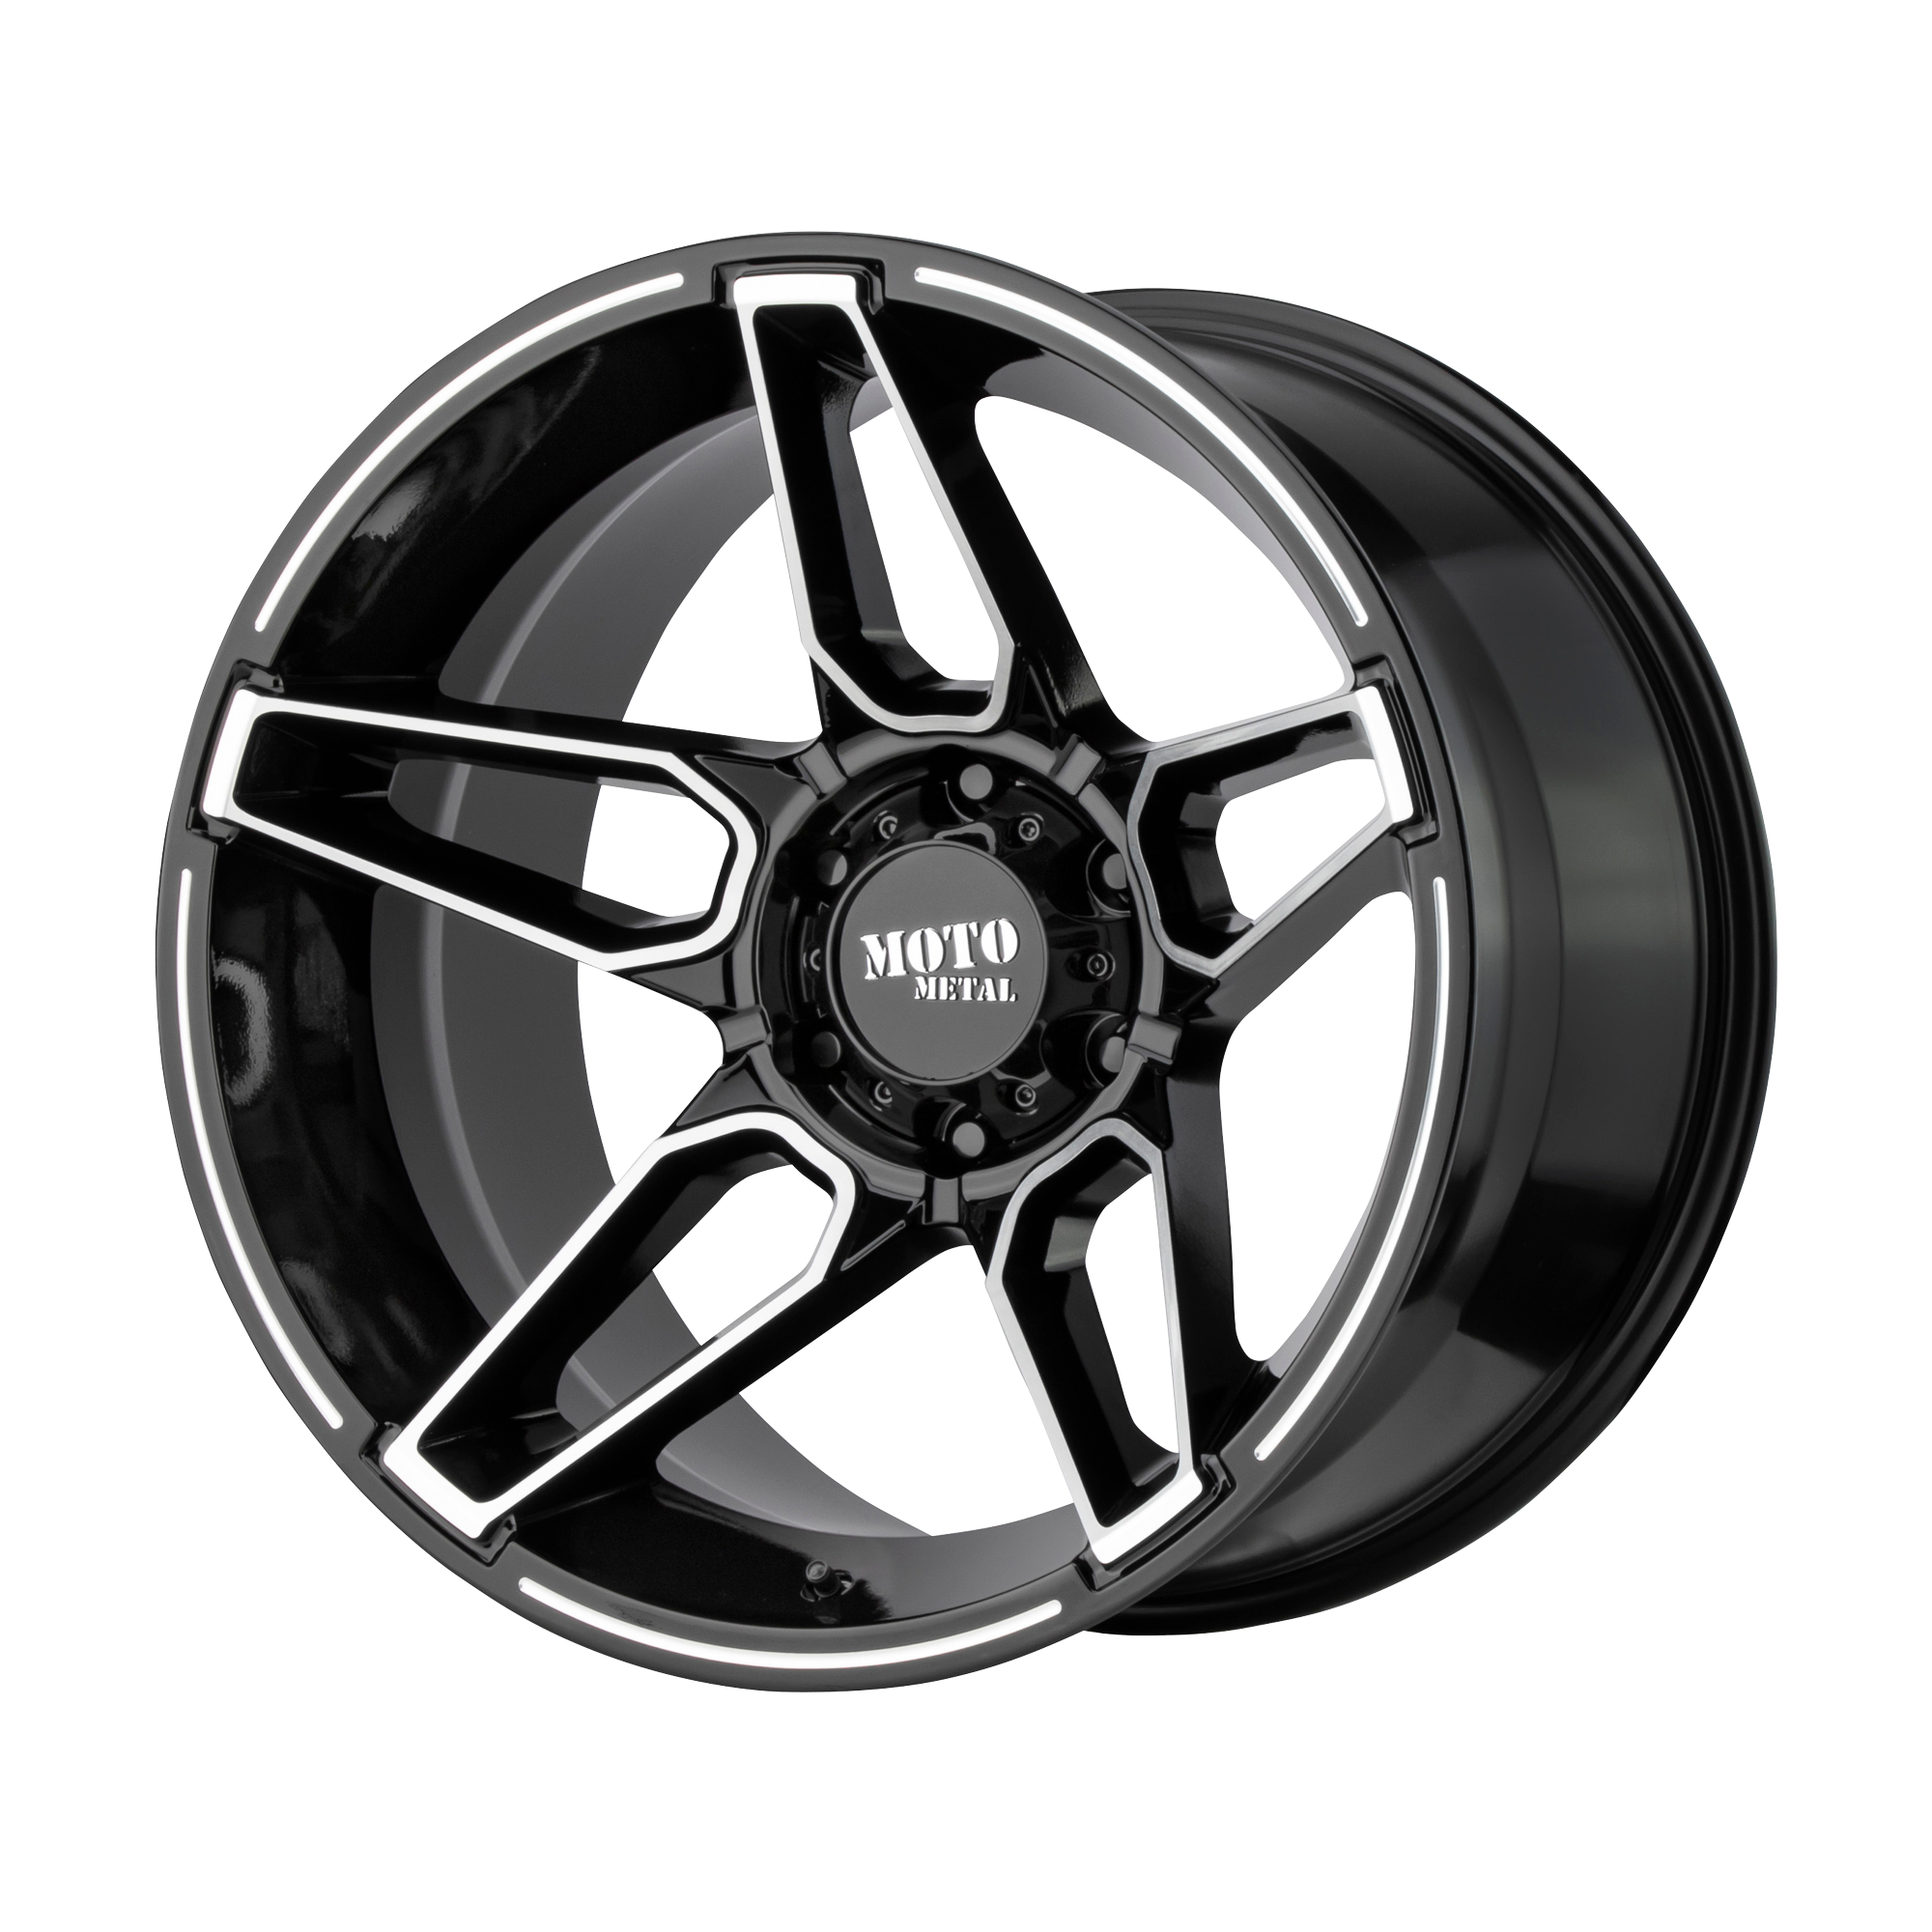 MOTO METAL MO994 FANG hliníkové disky 10x20 5x139,7 ET-18 Gloss Black Machined